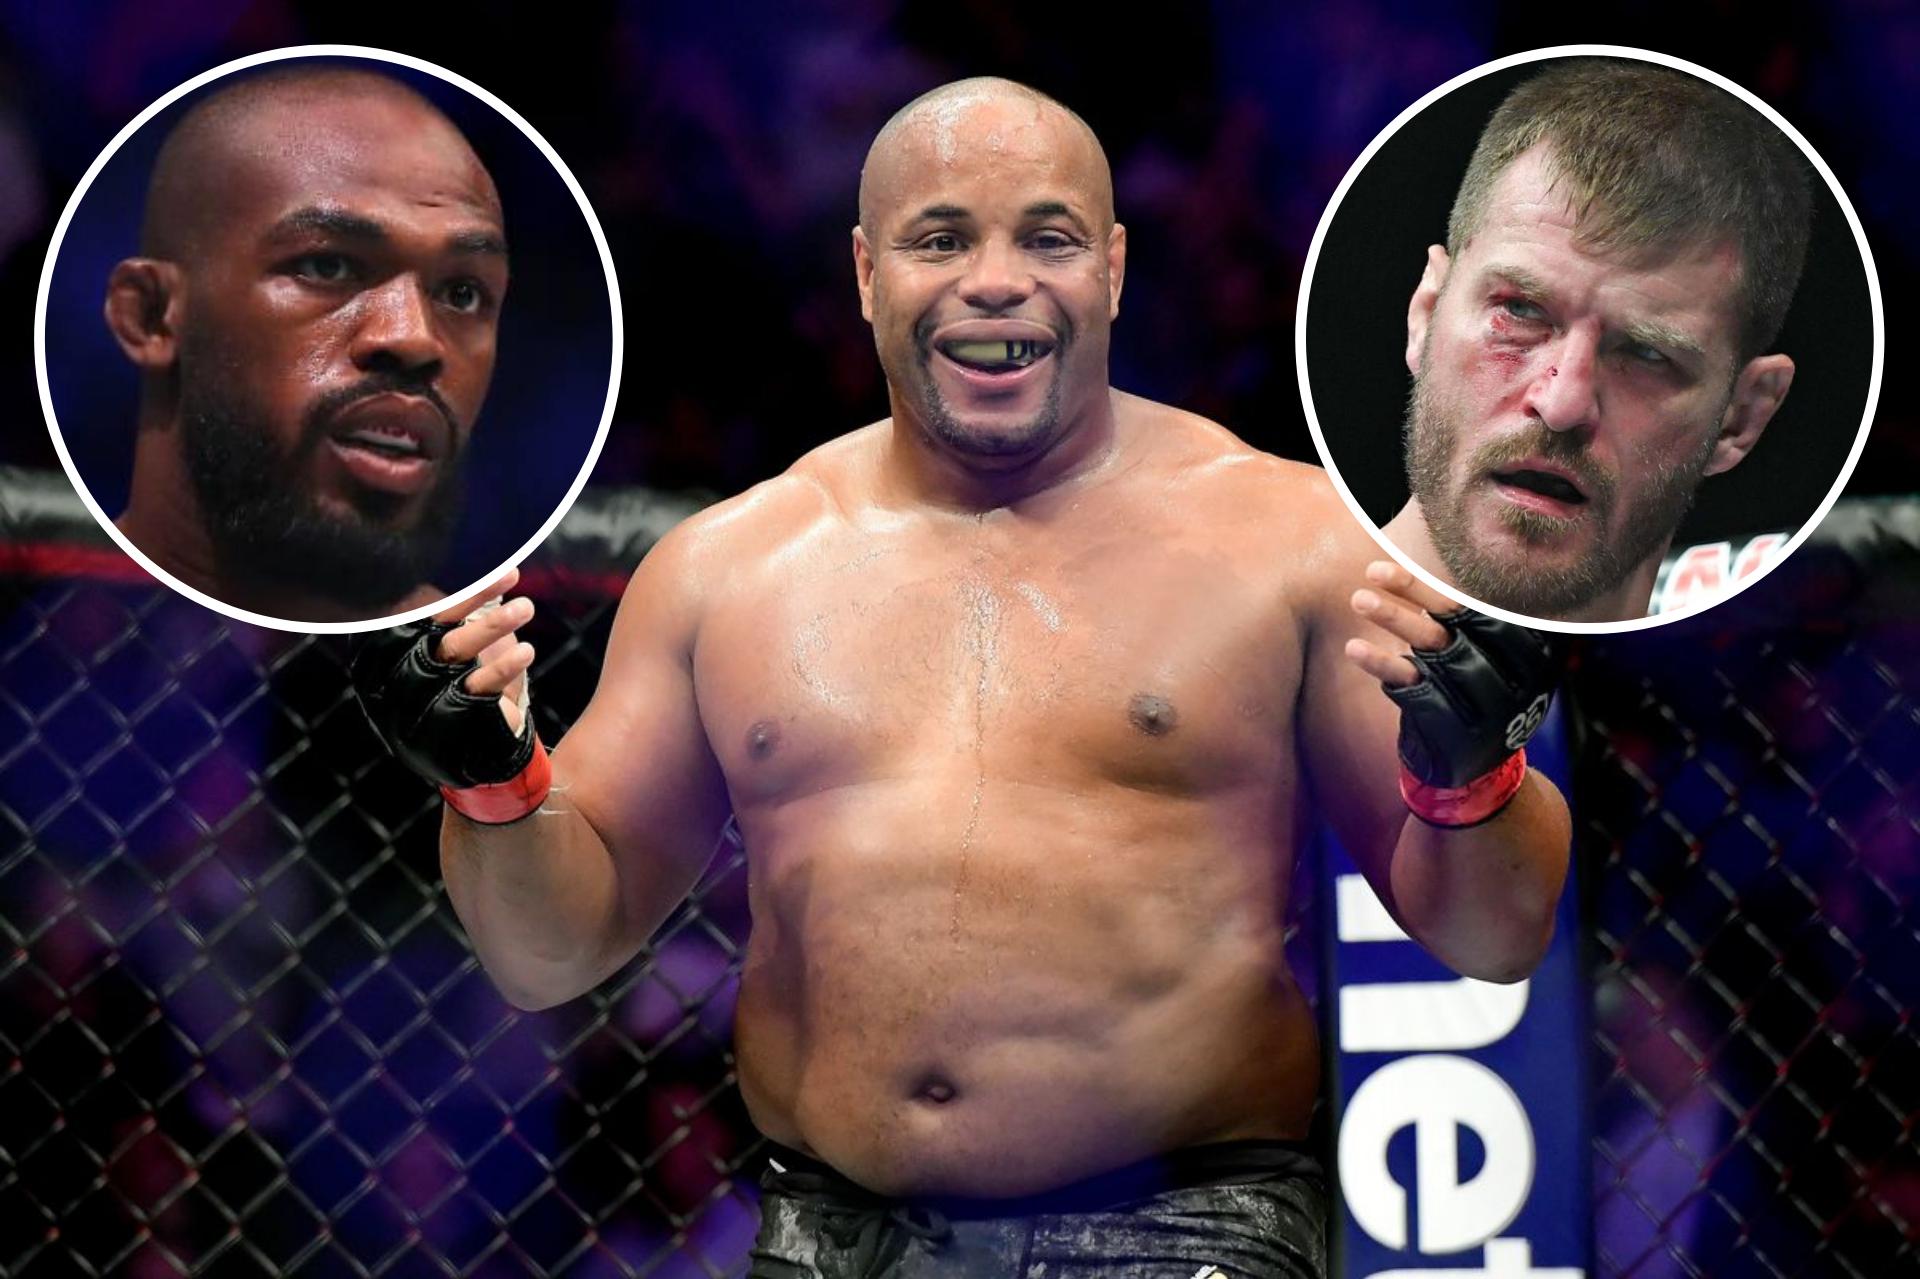 UFC News: Daniel Cormier confirms Stipe Miocic trilogy is his last fight, no more Jon Jones in his life - Cormier